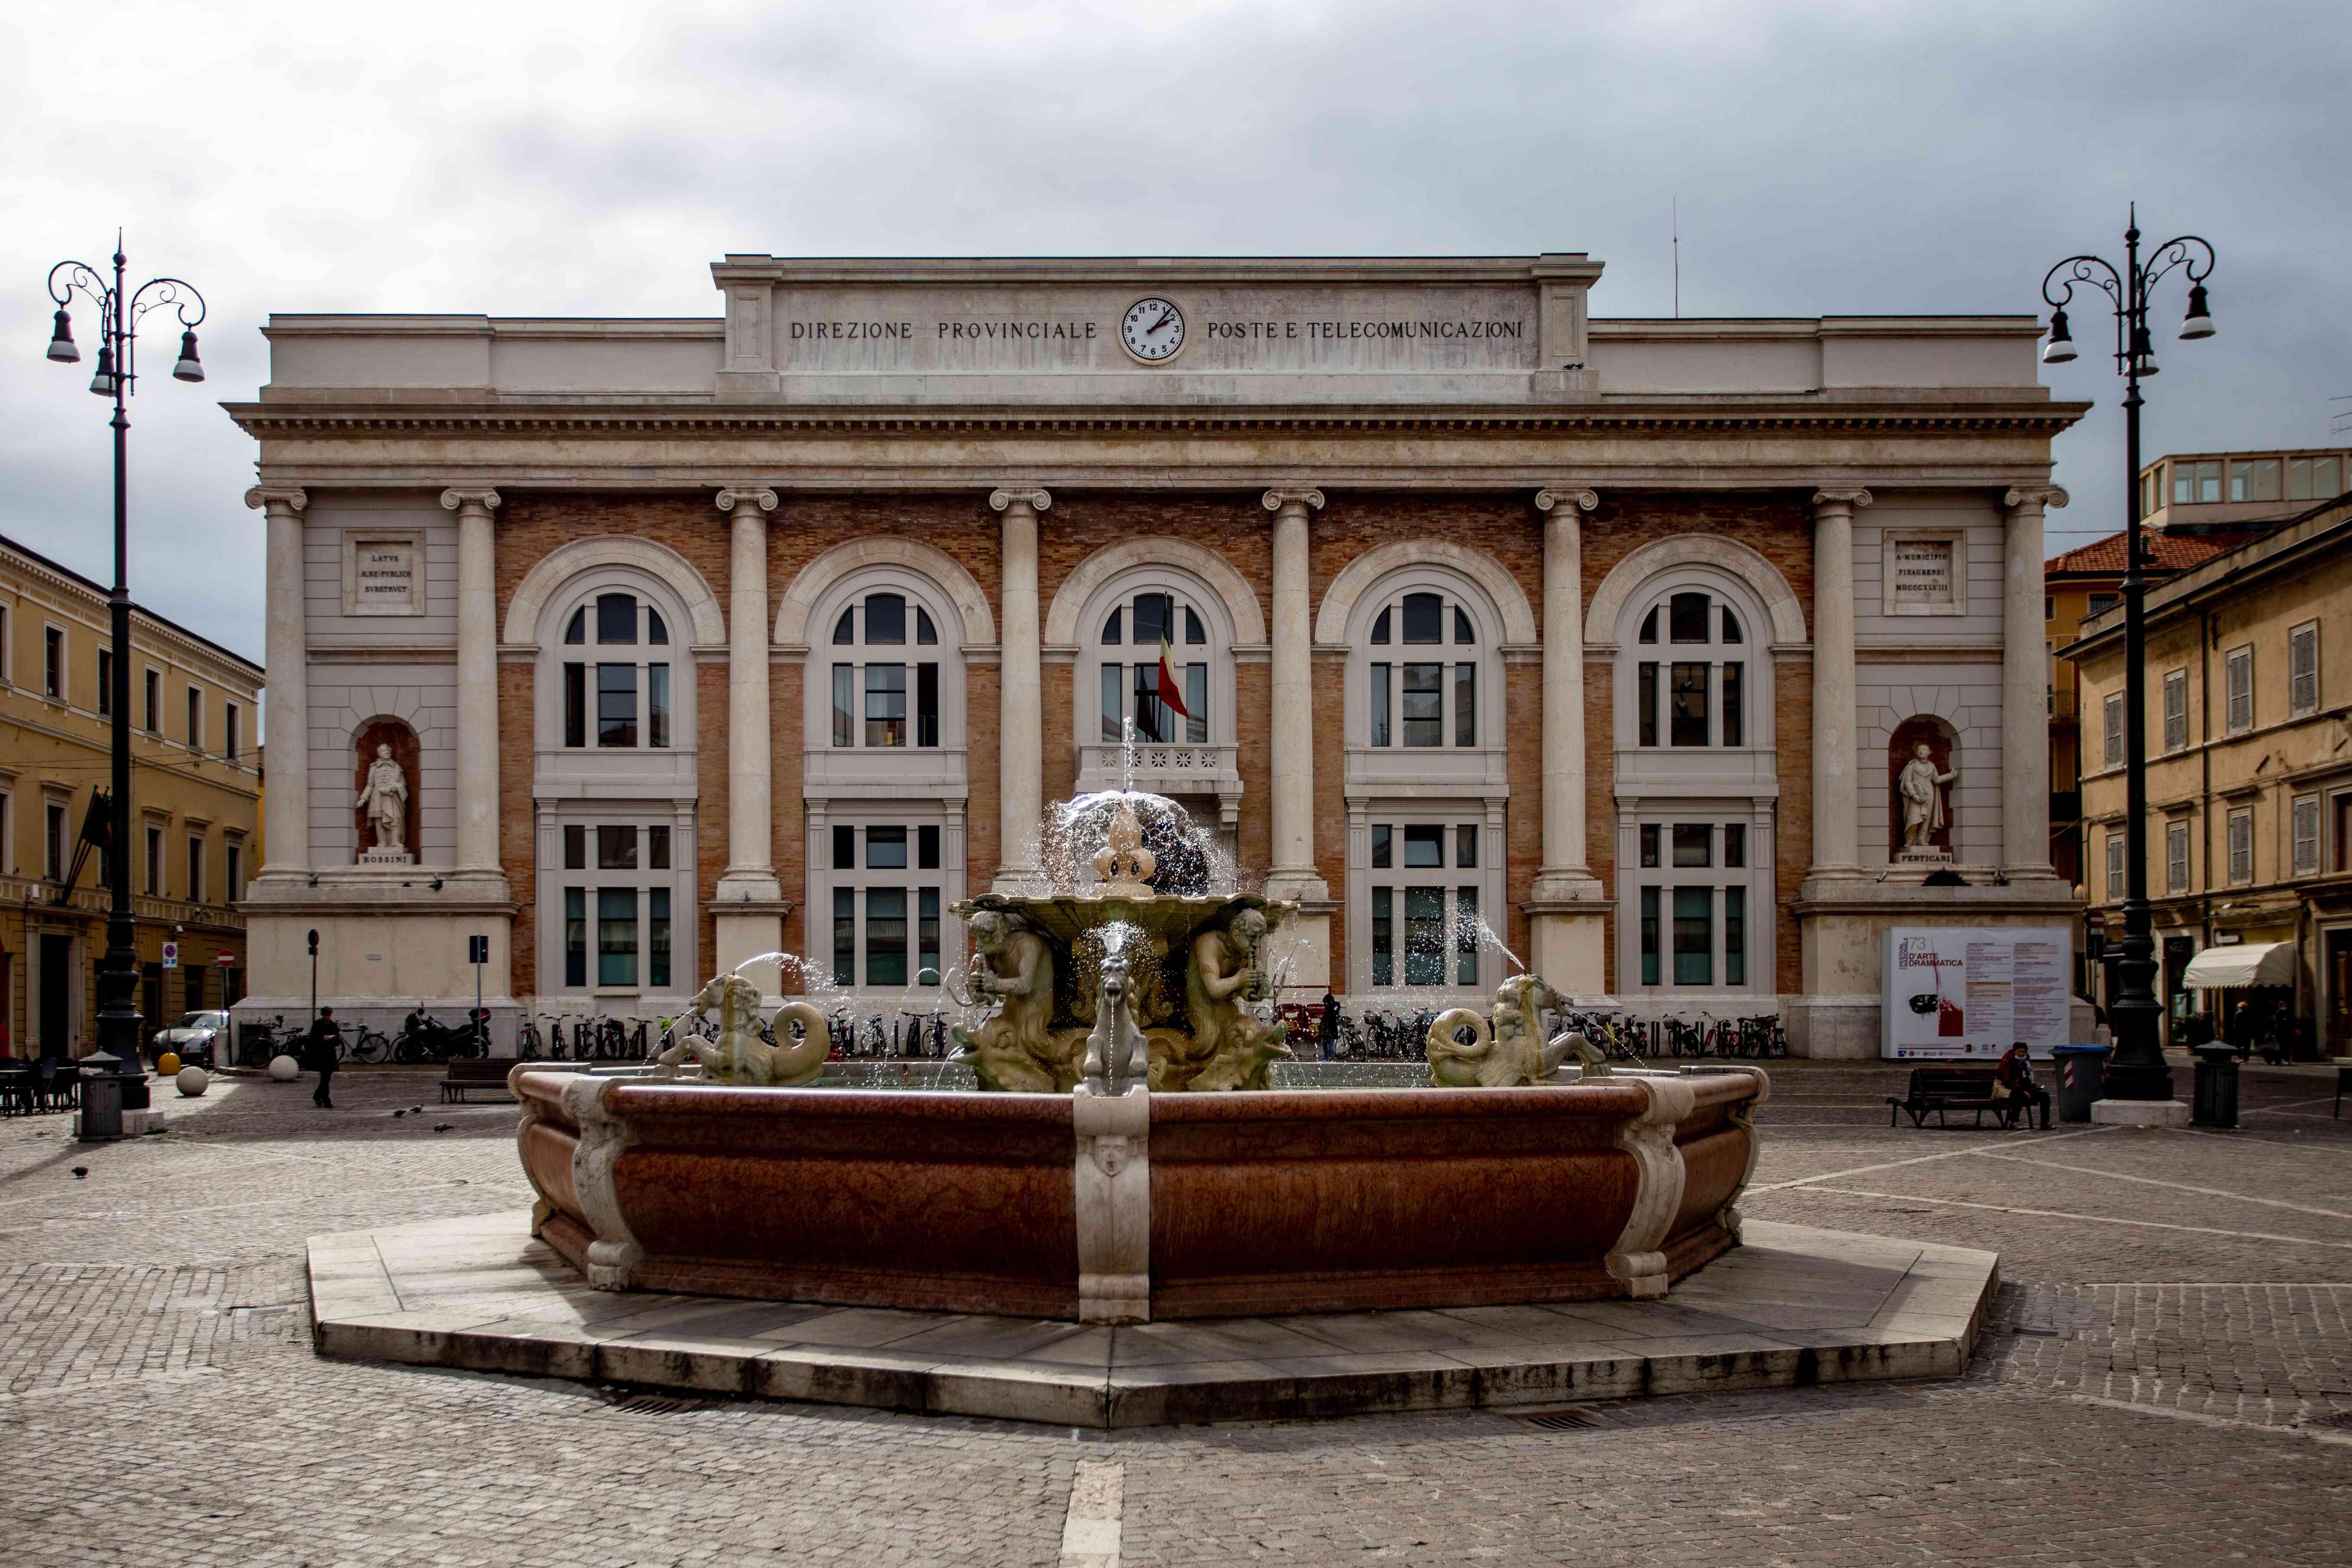 Piazza del Popolo in Pesaro, Italy